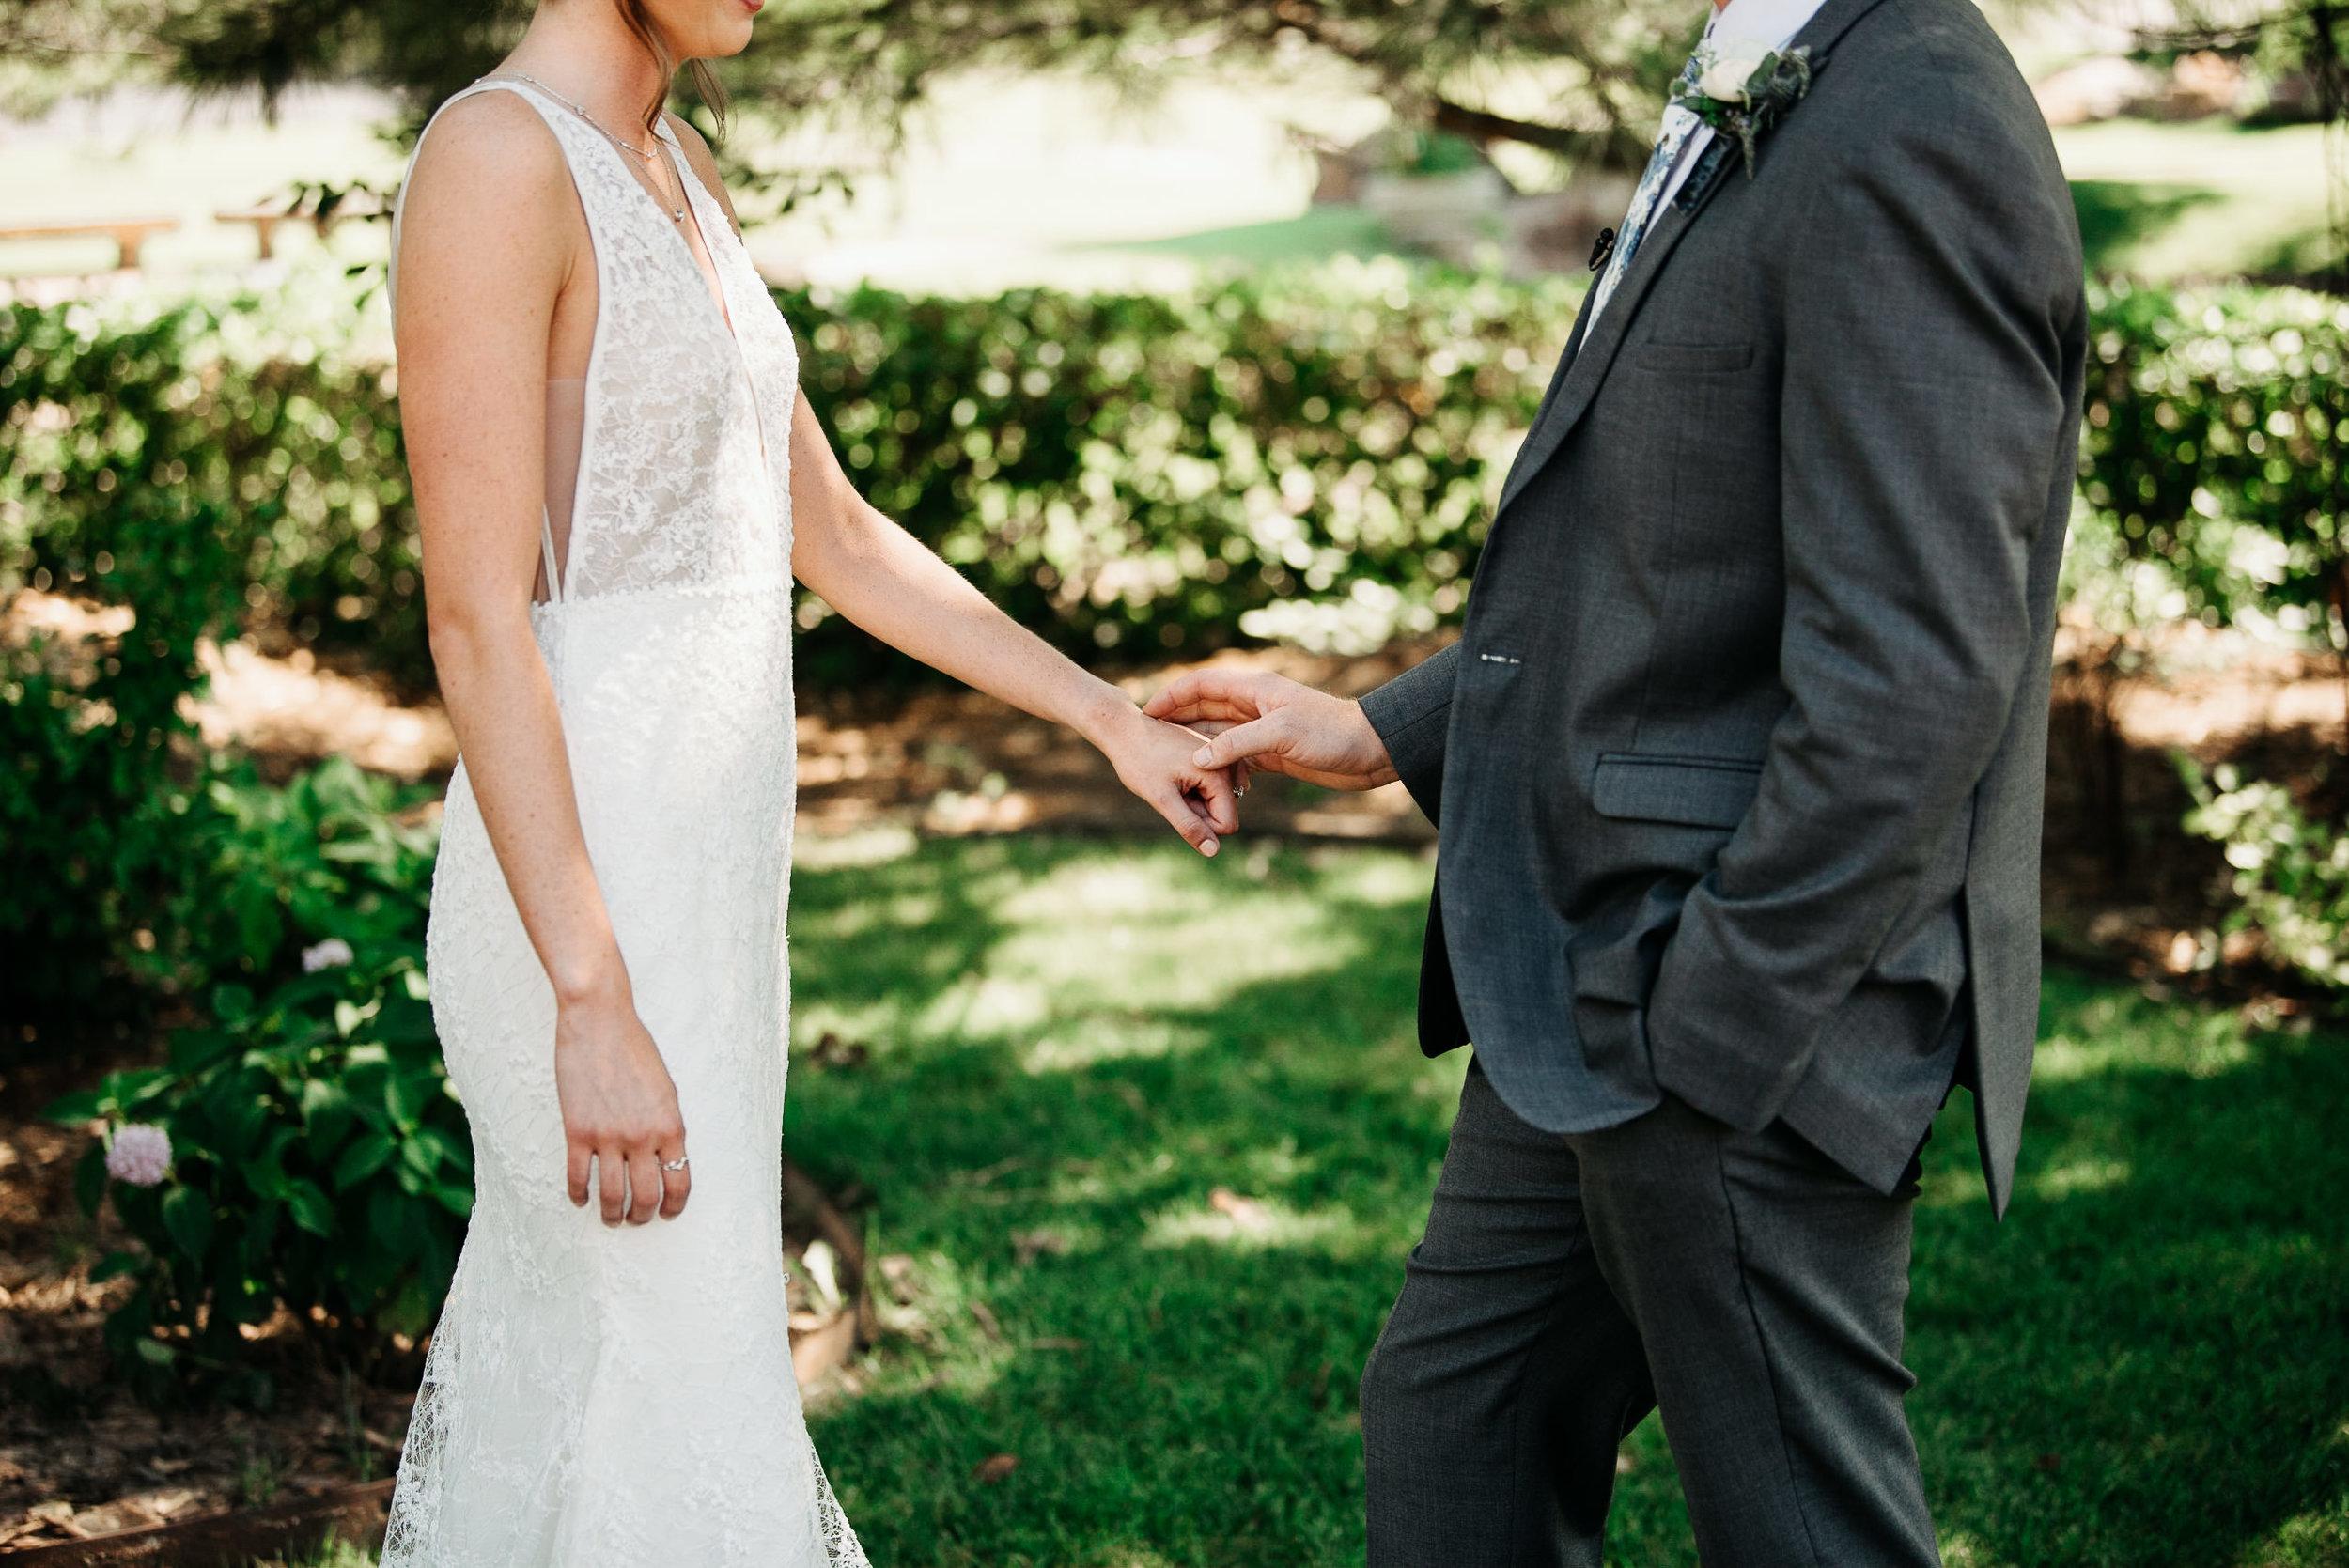 okc-wedding-photographer-coles-garden-wedding-okc-best-wedding-photographers-44.jpg